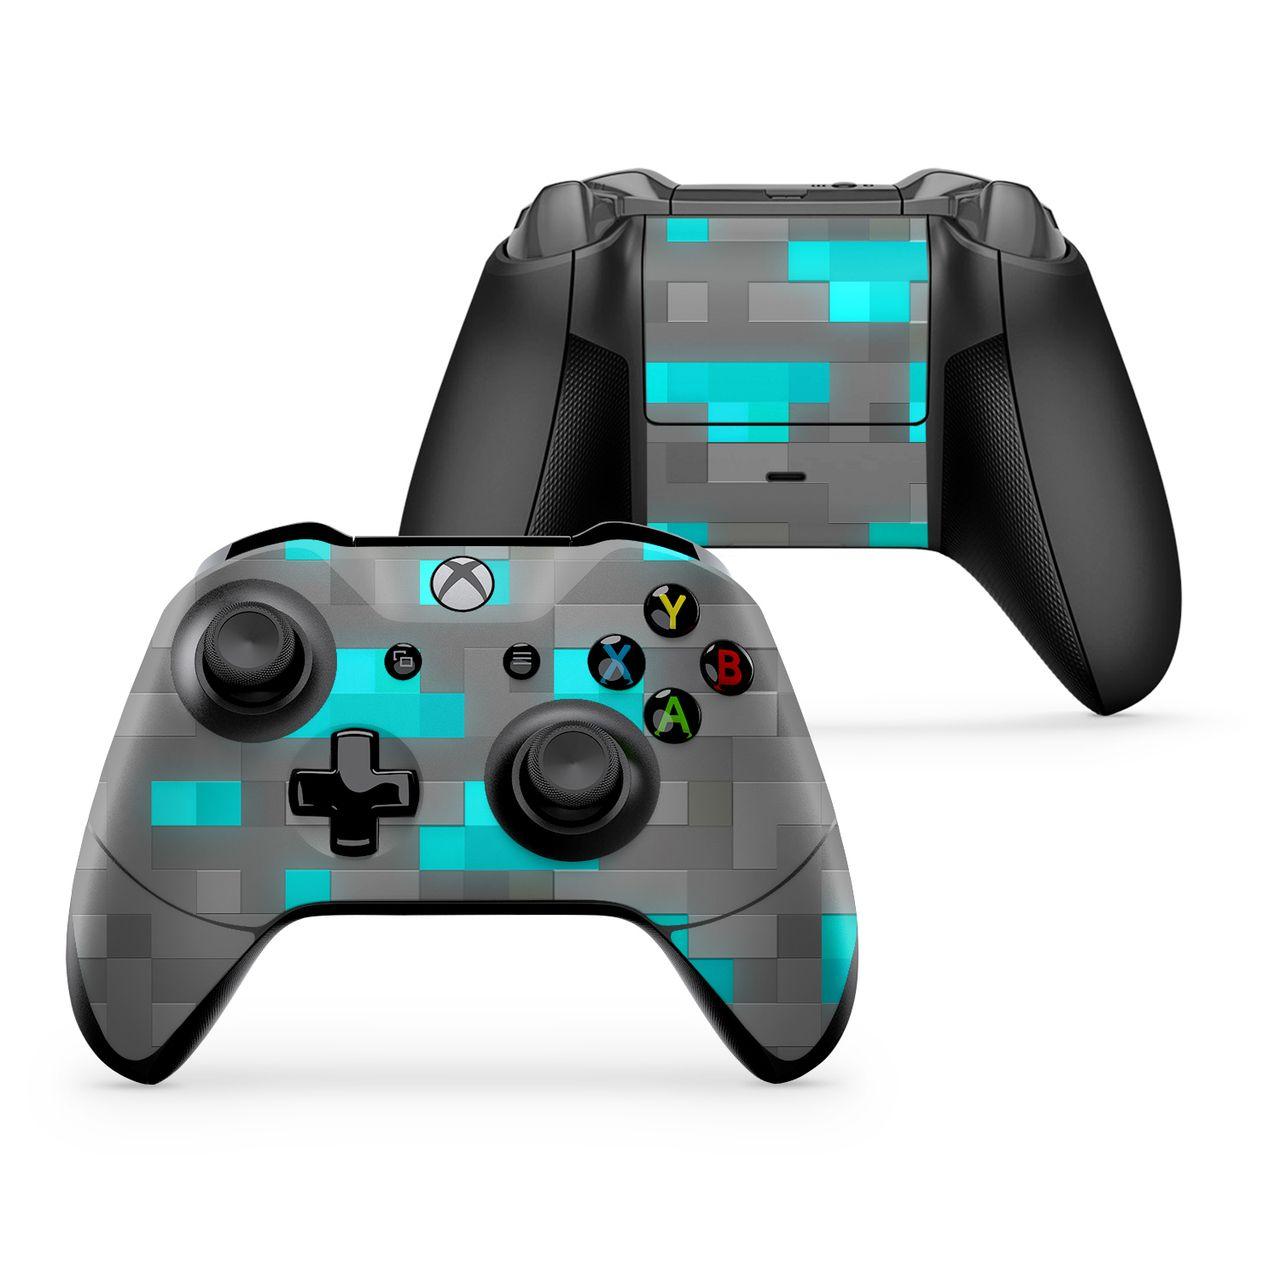 Pixel Diamond Block Xbox One X Controller Minecraft Pixel Art